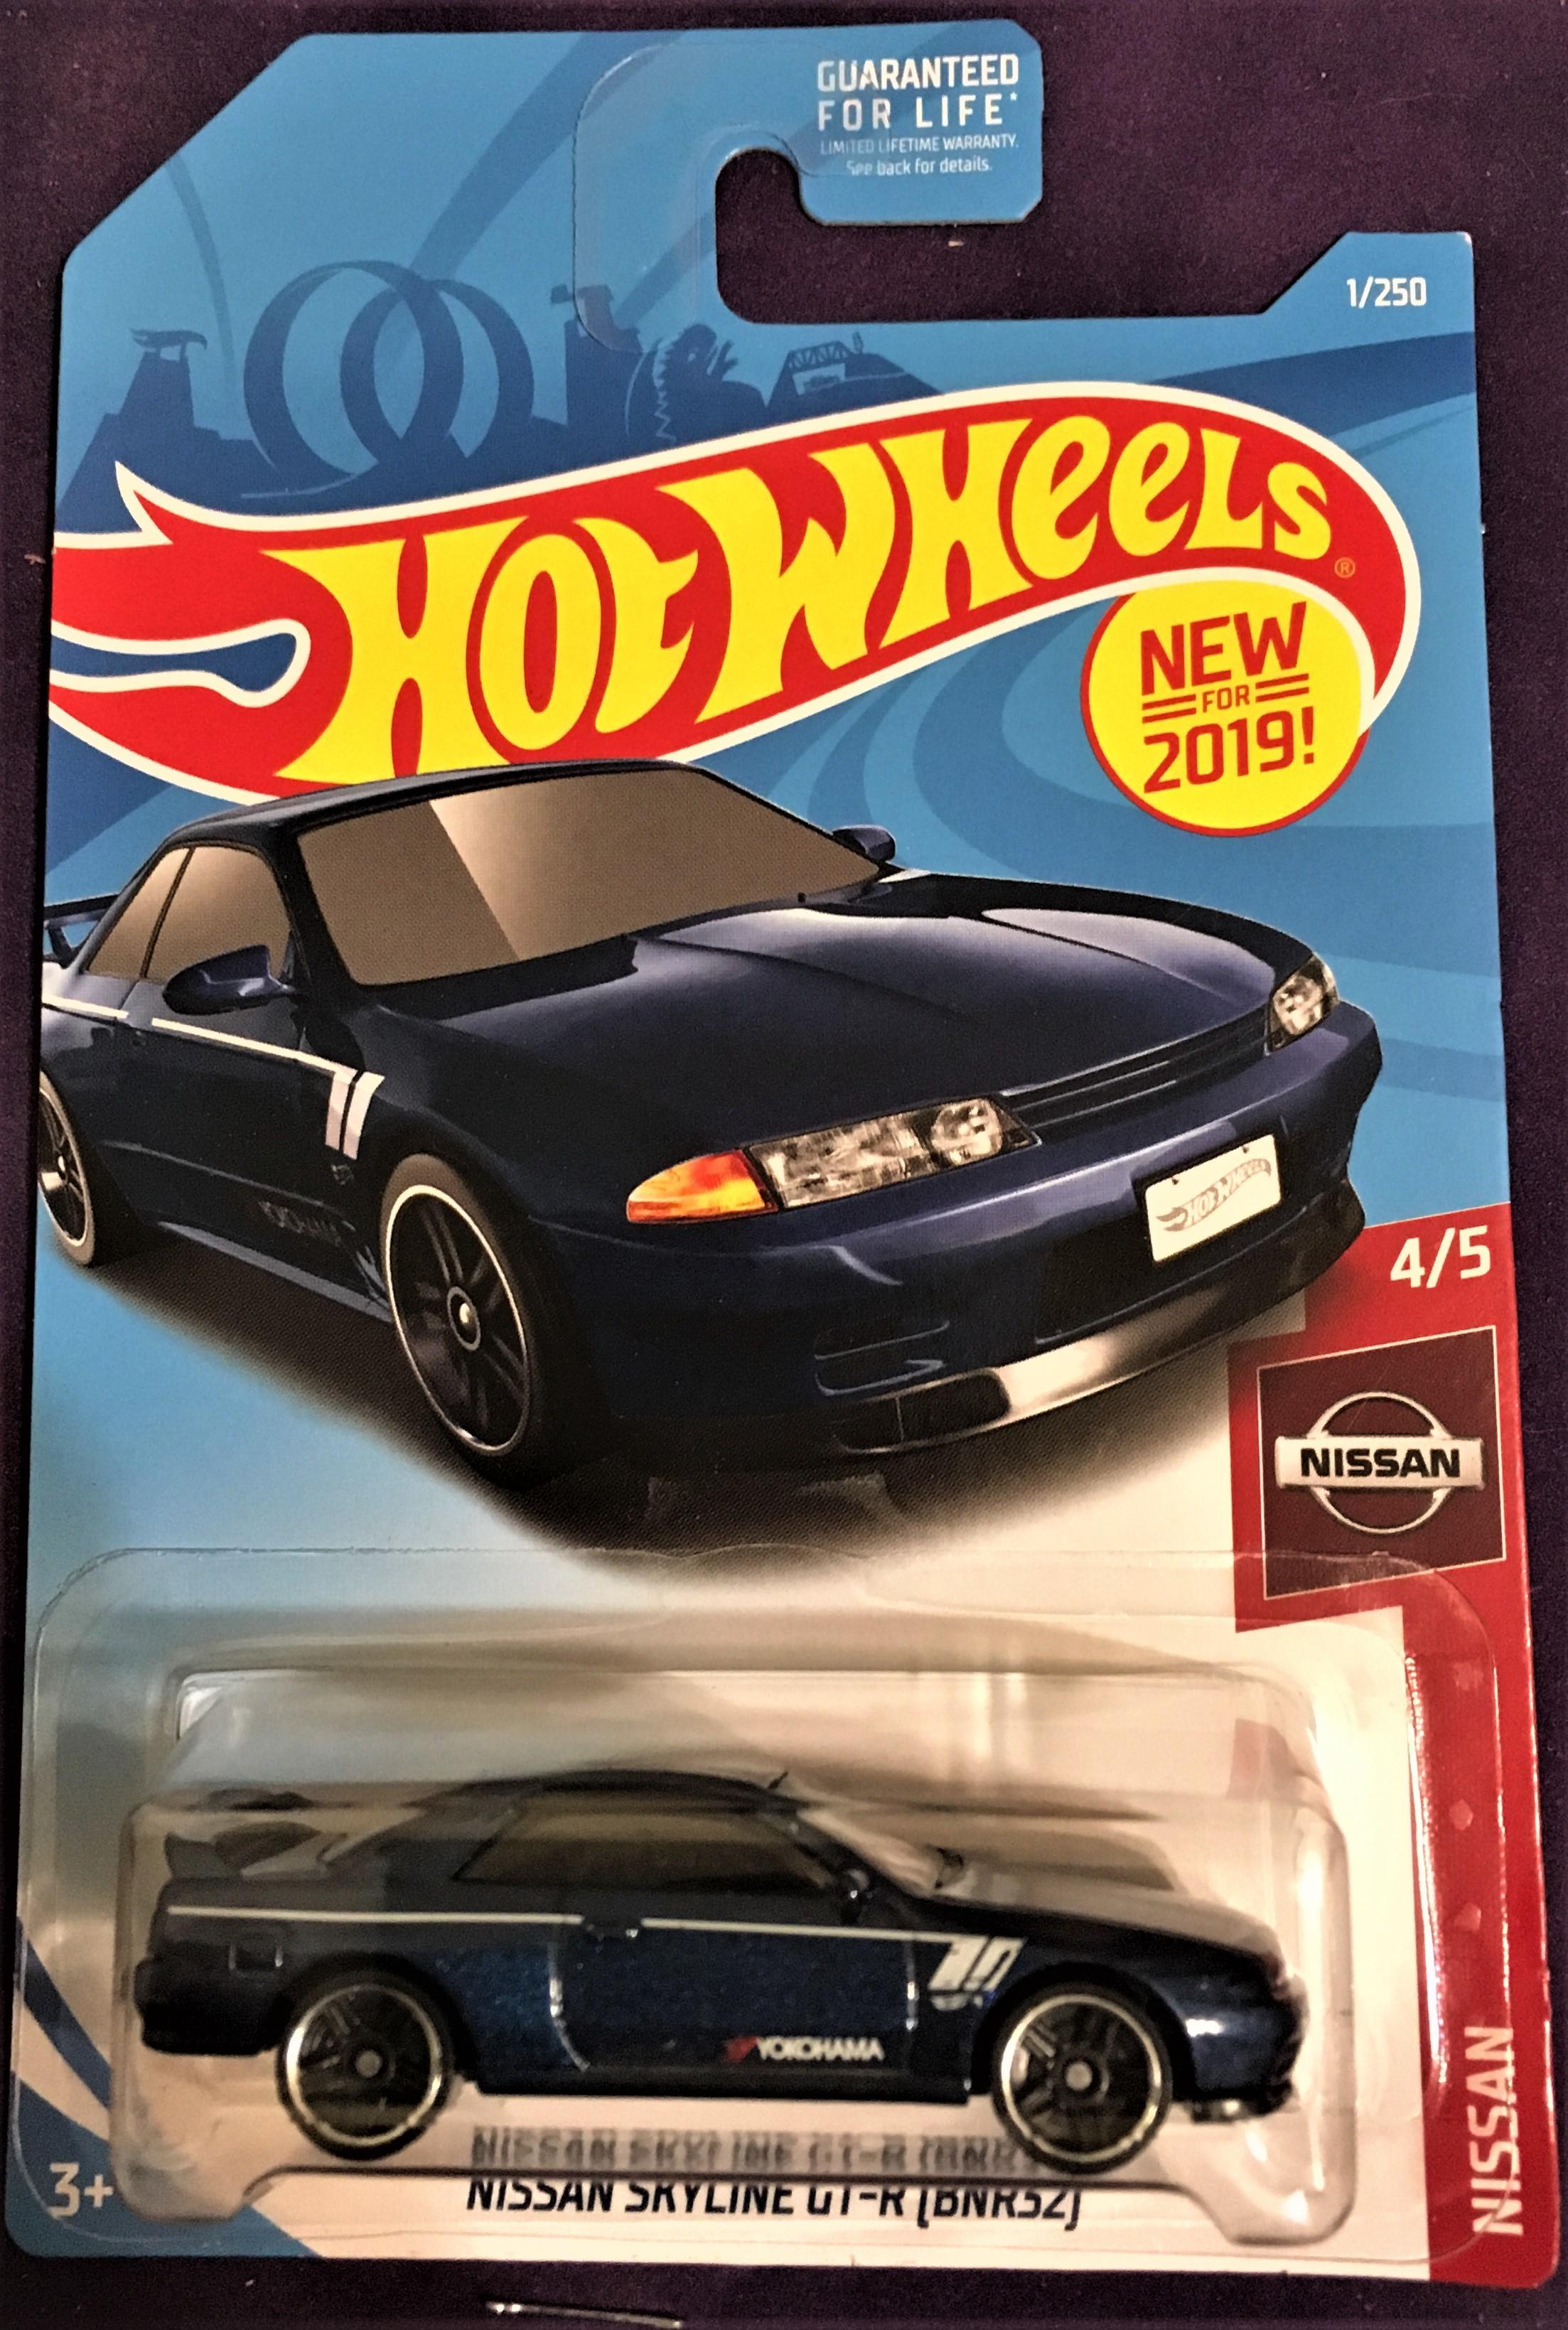 2019 Hot Wheels 1 Nissan Skyline Gt R Bnr32 Hobbydb